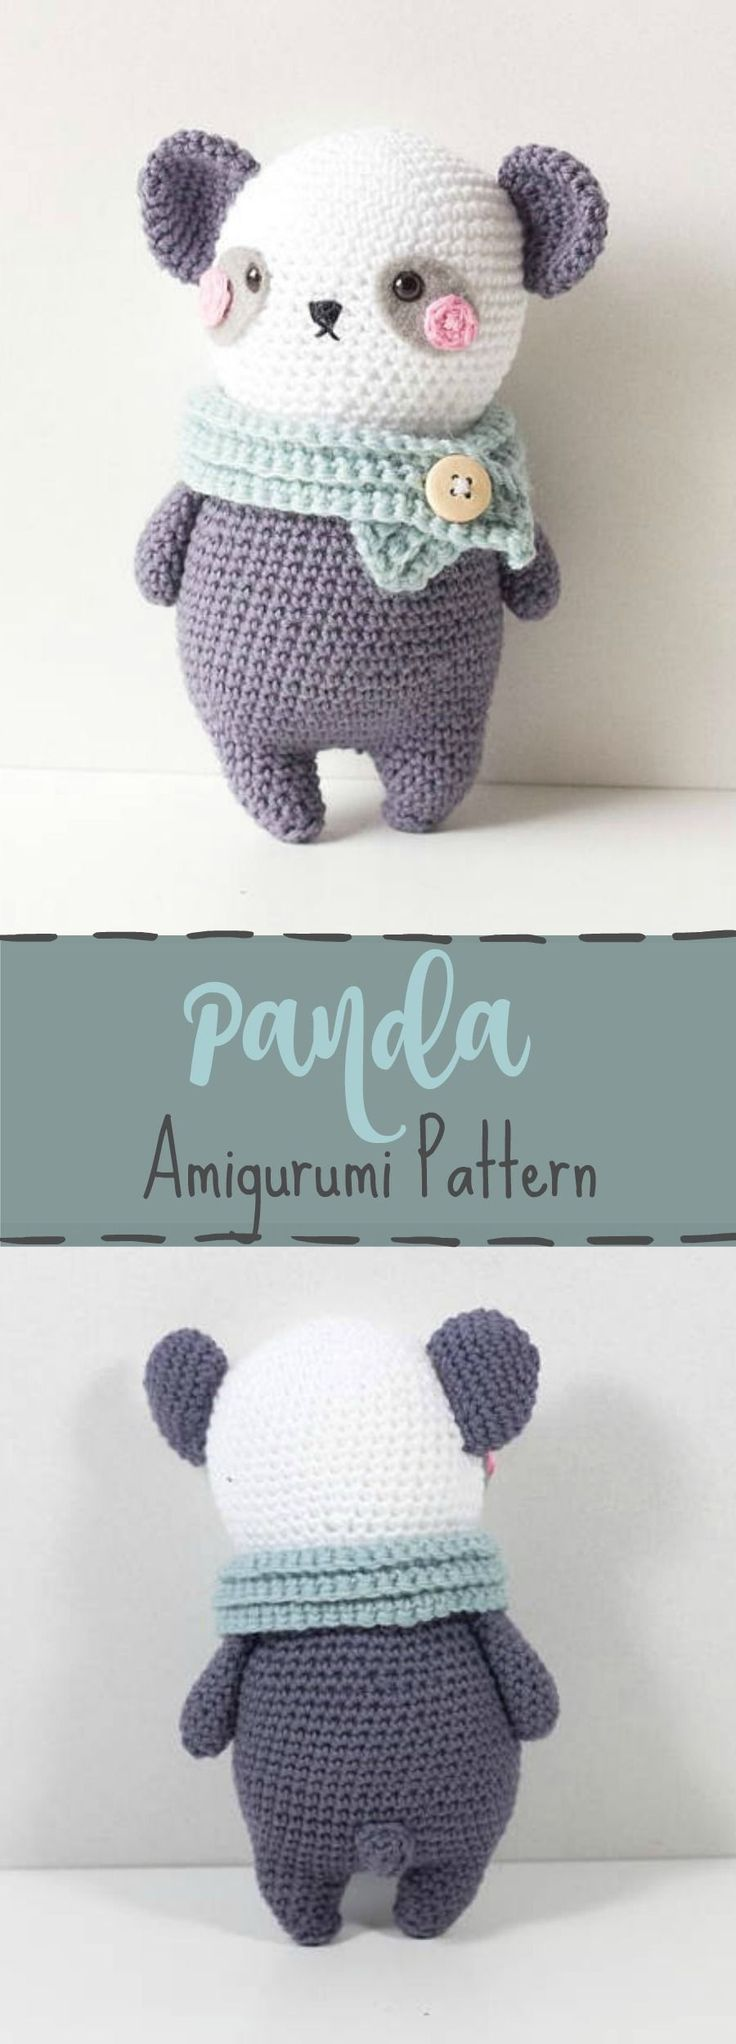 Crochet pattern Panda Bear Amigurumi, Amigurumi pattern Panda Bear, crochet tutorial Panda Bear, Stuffed Animal crochet pattern Panda ...#affiliate #crochetdolls